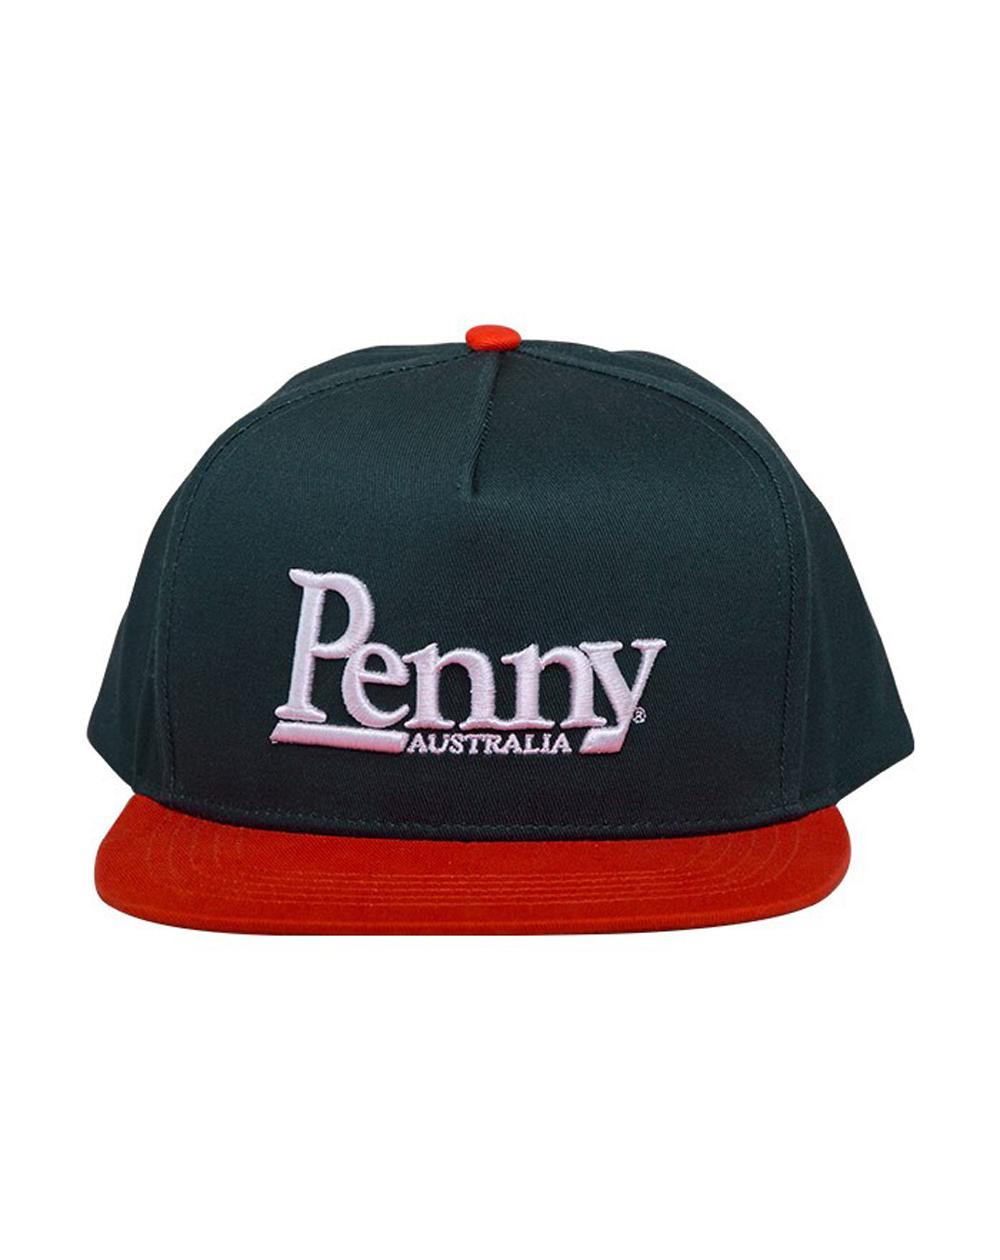 Penny Logo Boné Snapback para Homem Dark Green/Orange